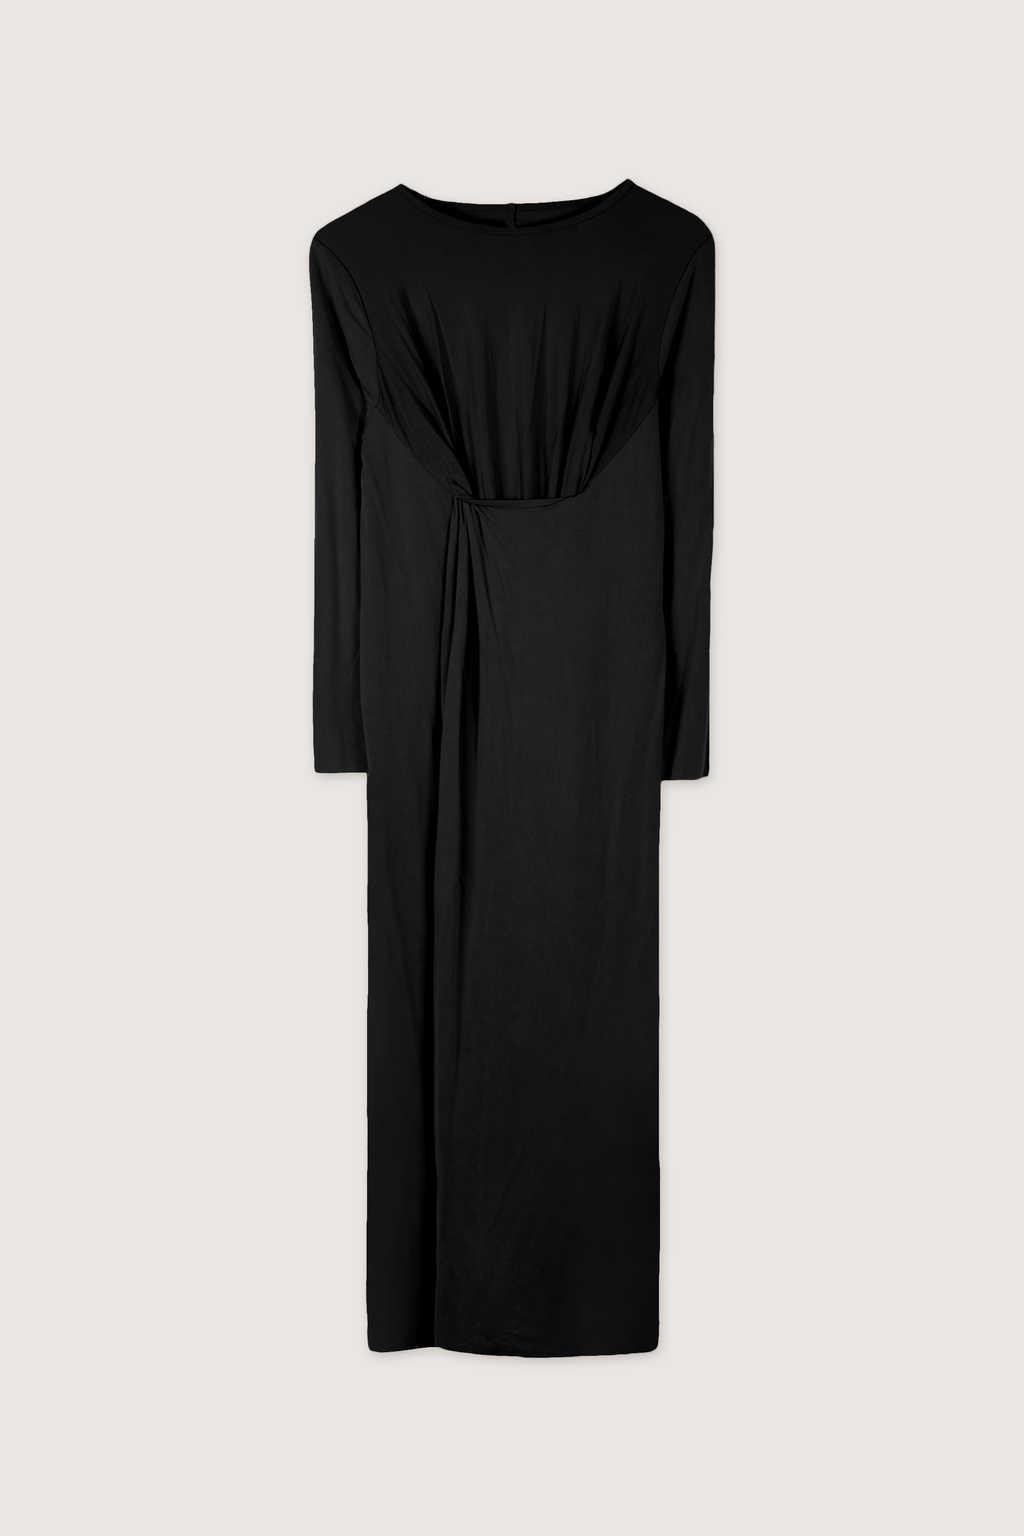 Dress 1673 Black 9